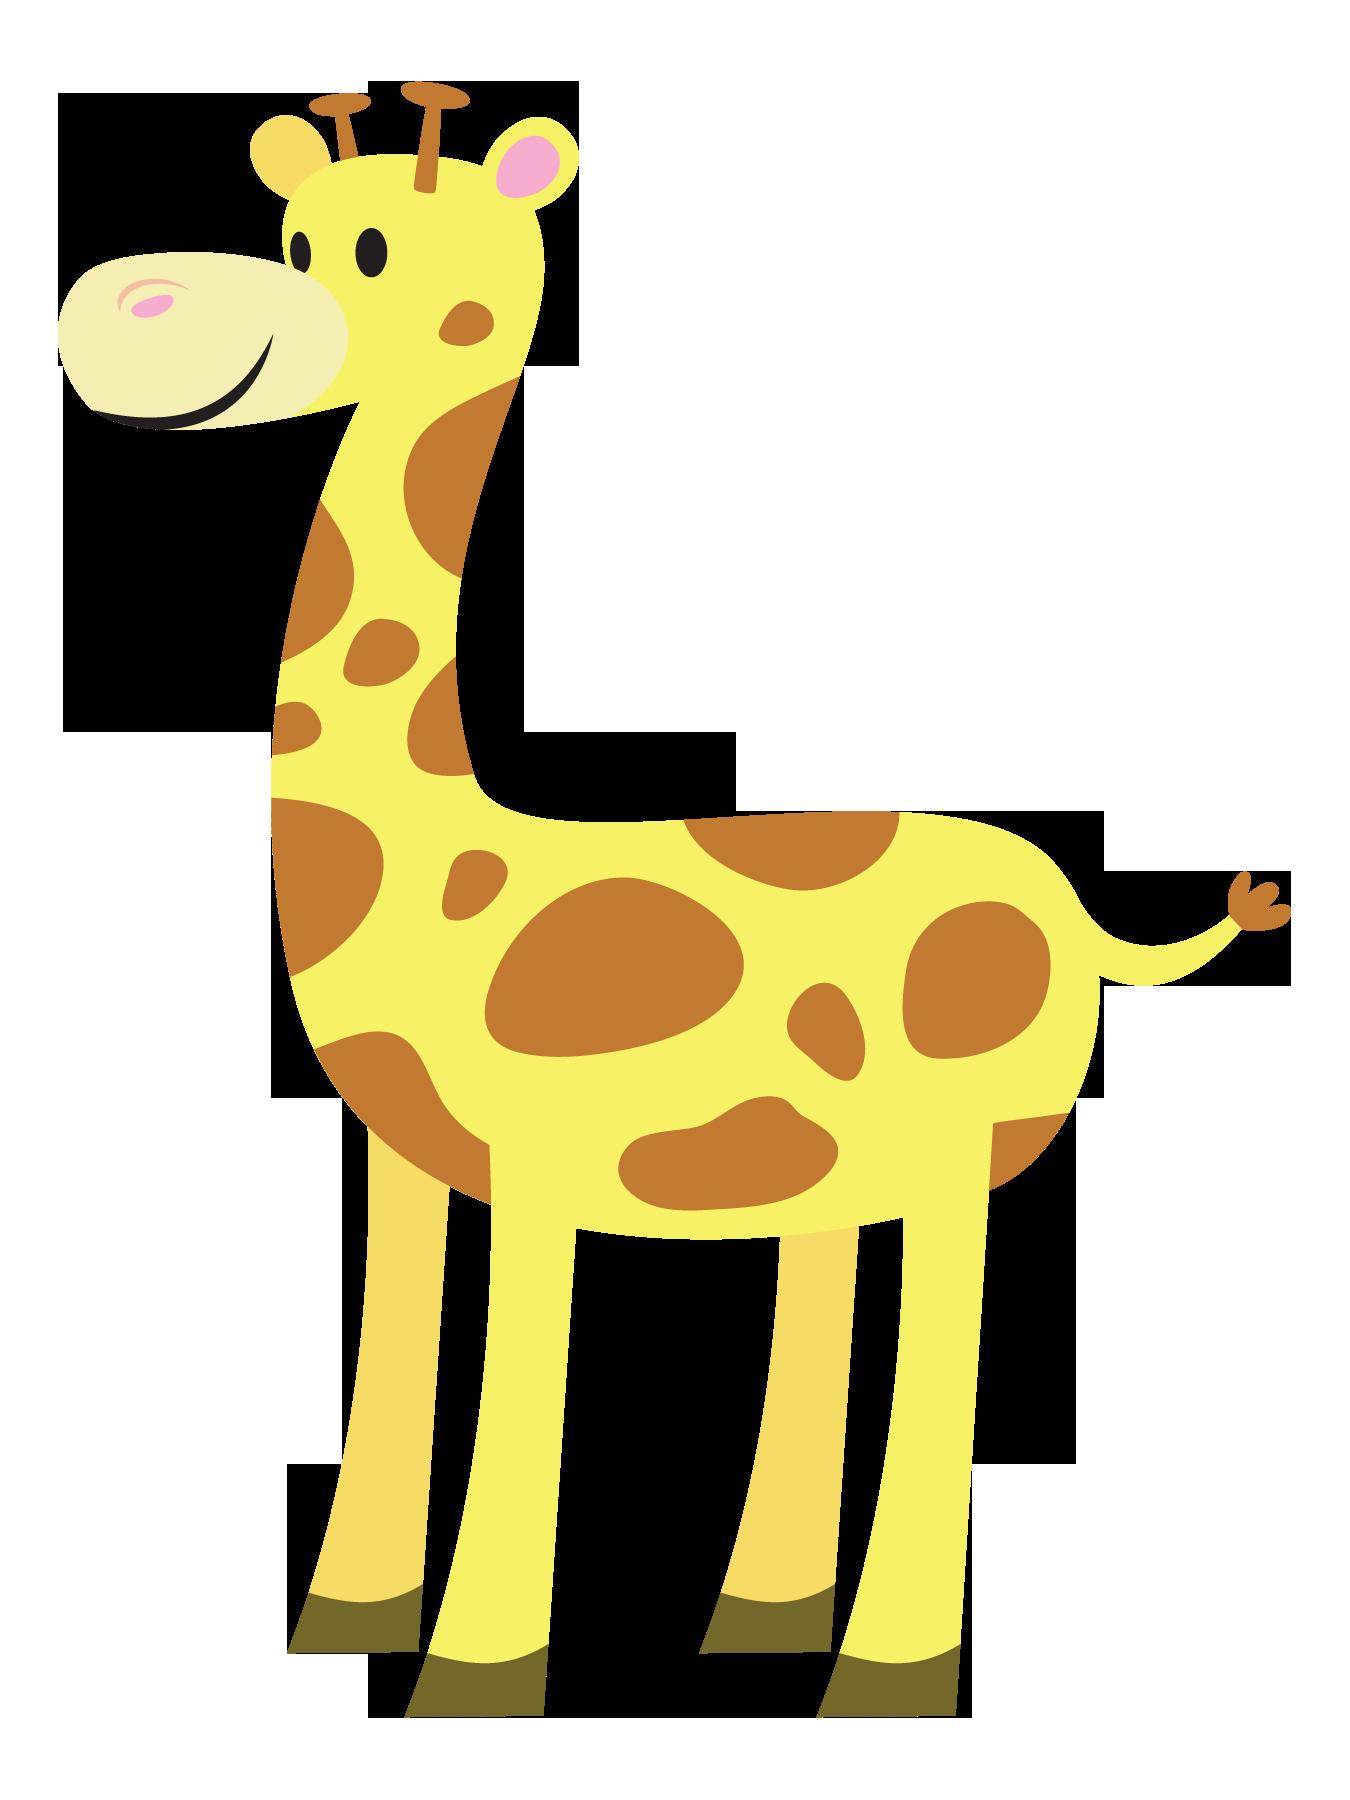 Baby shower giraffe clip art png royalty free stock Giraffe Baby Shower Clipart - Clipart Kid png royalty free stock